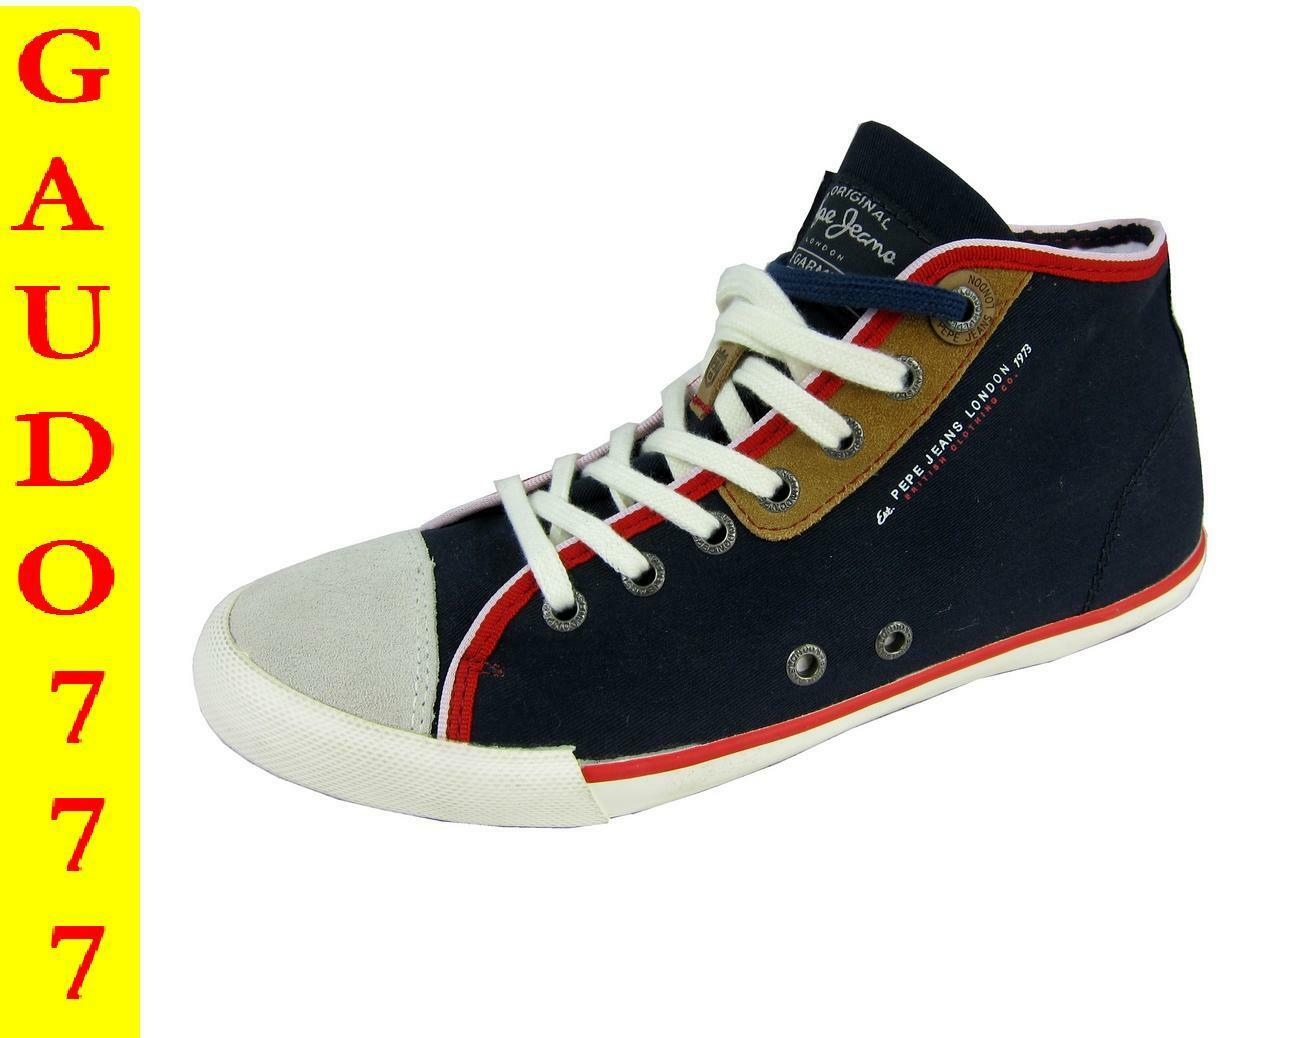 ADIDAS CAFLAIRE B43745 Herrenschuhe Sneaker Herren Schuhe Tunschuhe Schwarz Neu